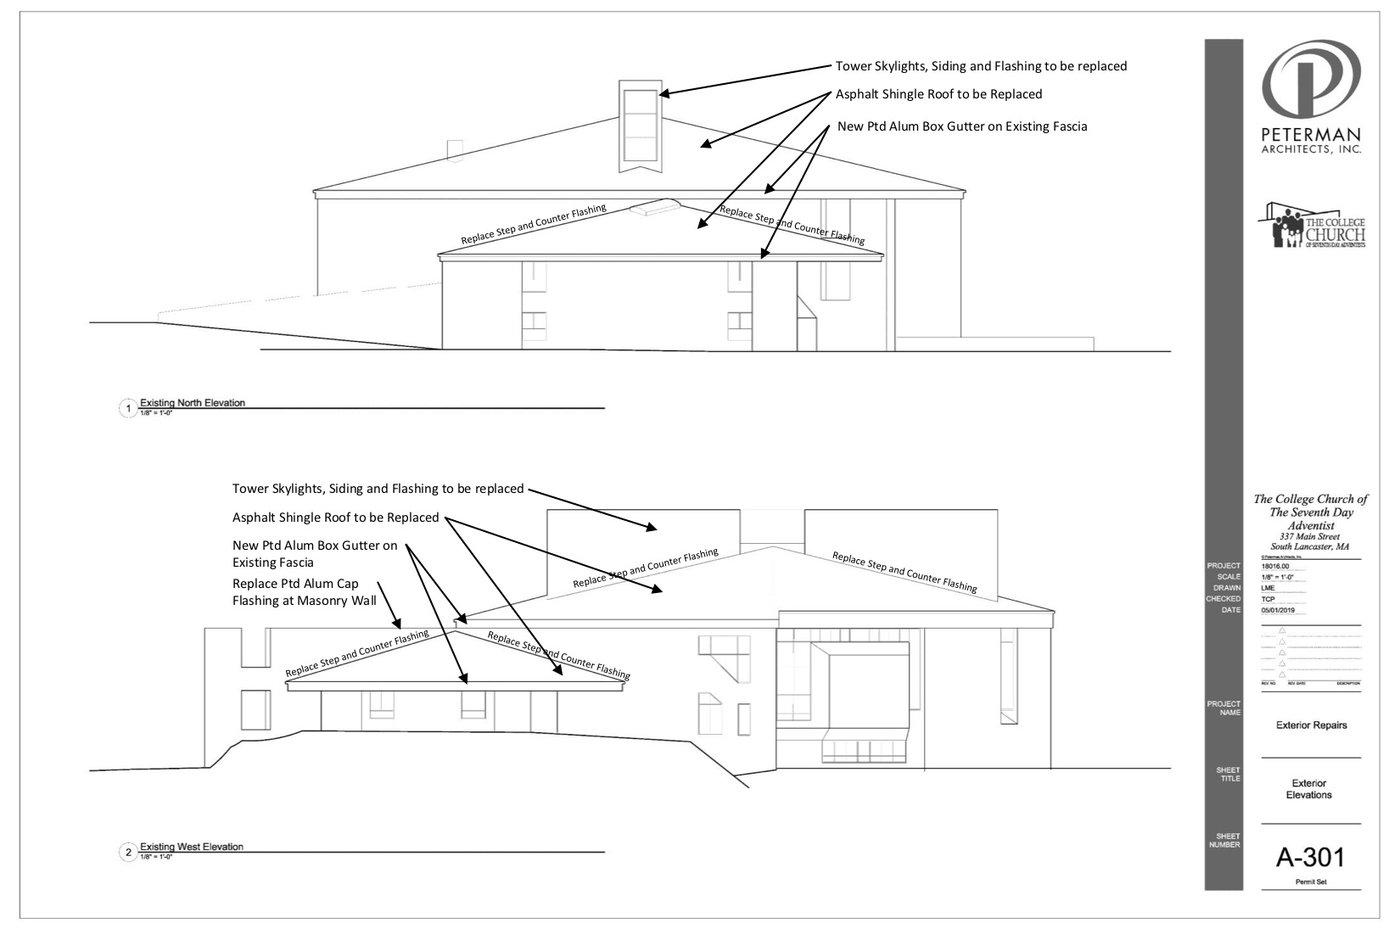 Blueprint 3 of roof